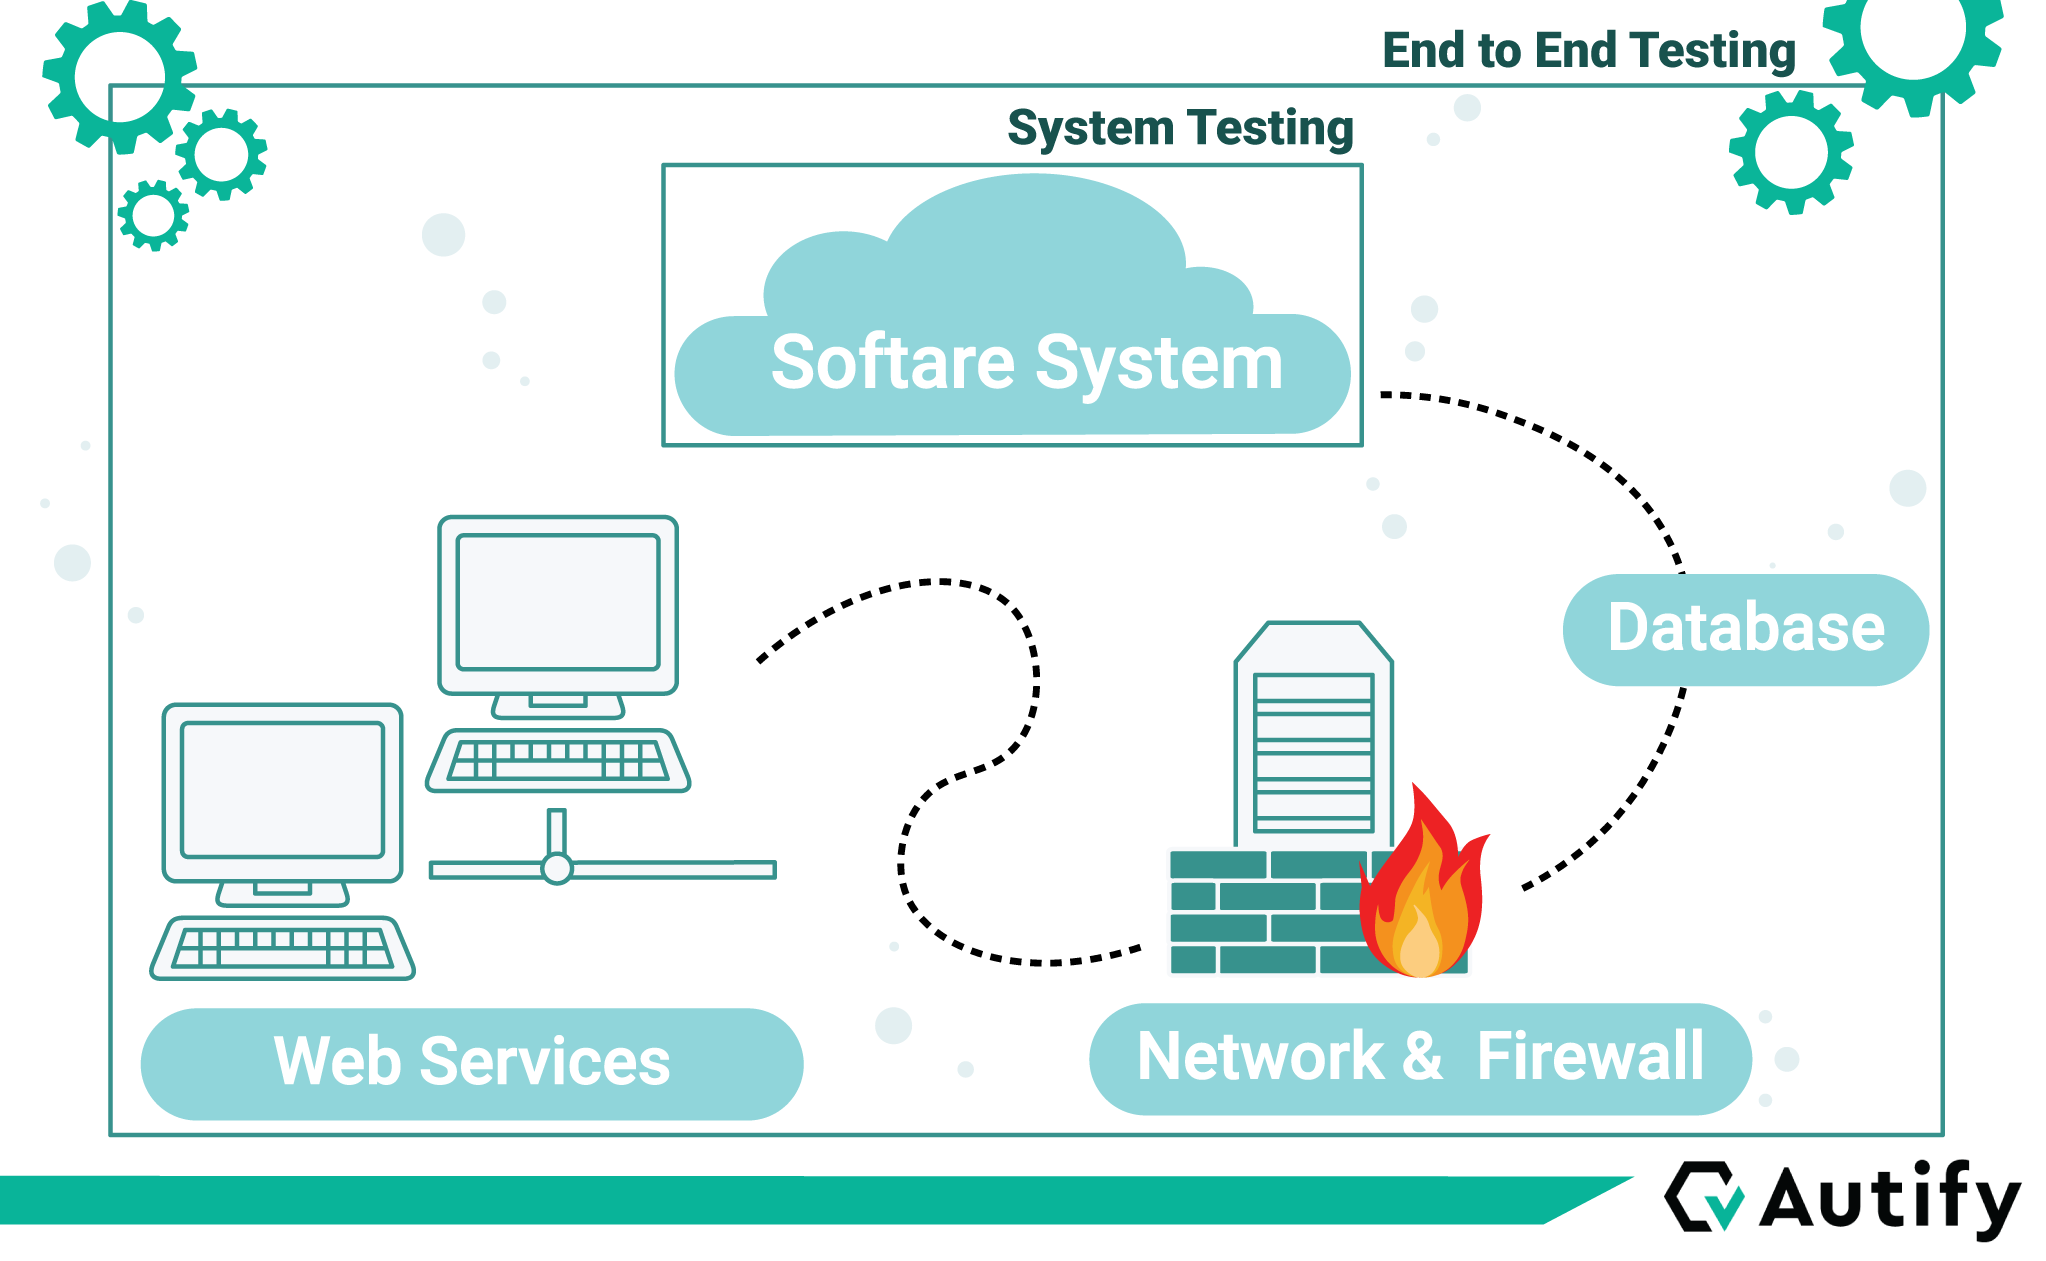 What is E2E testing?